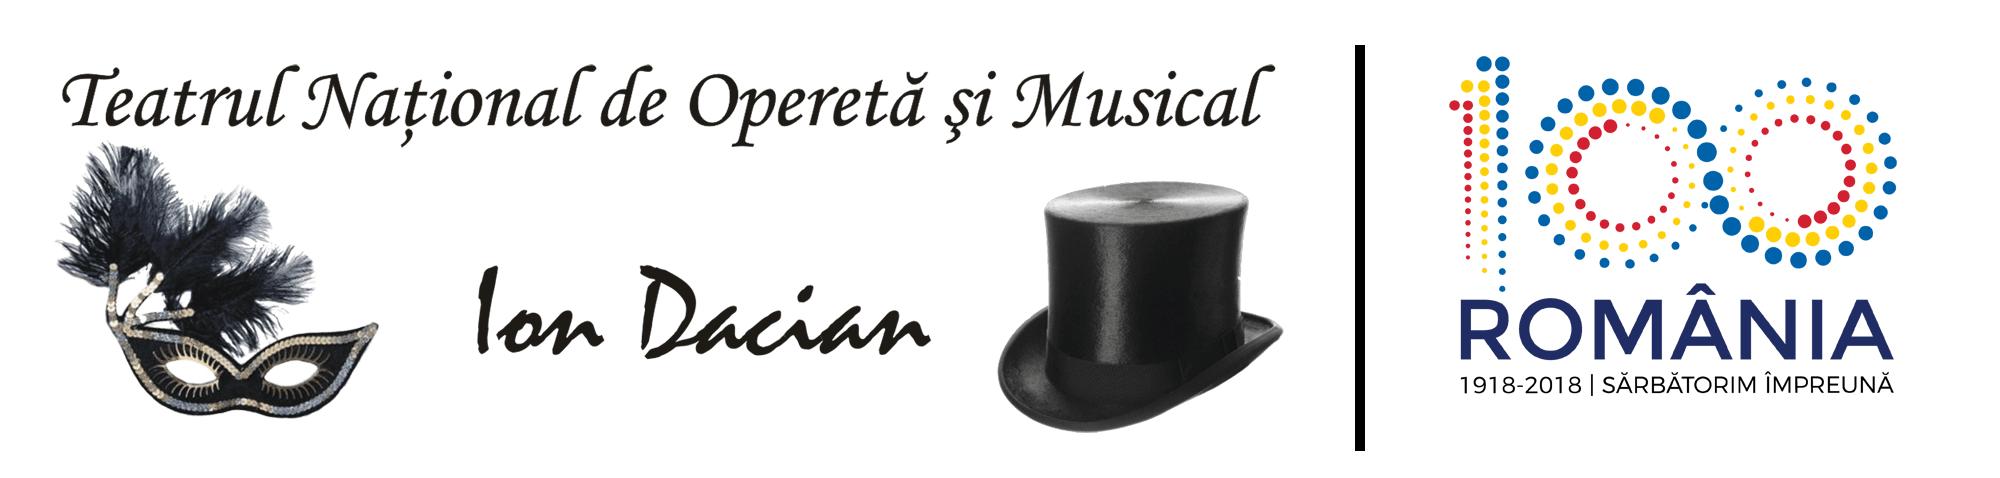 logo-opereta-centenar-colorat-lat